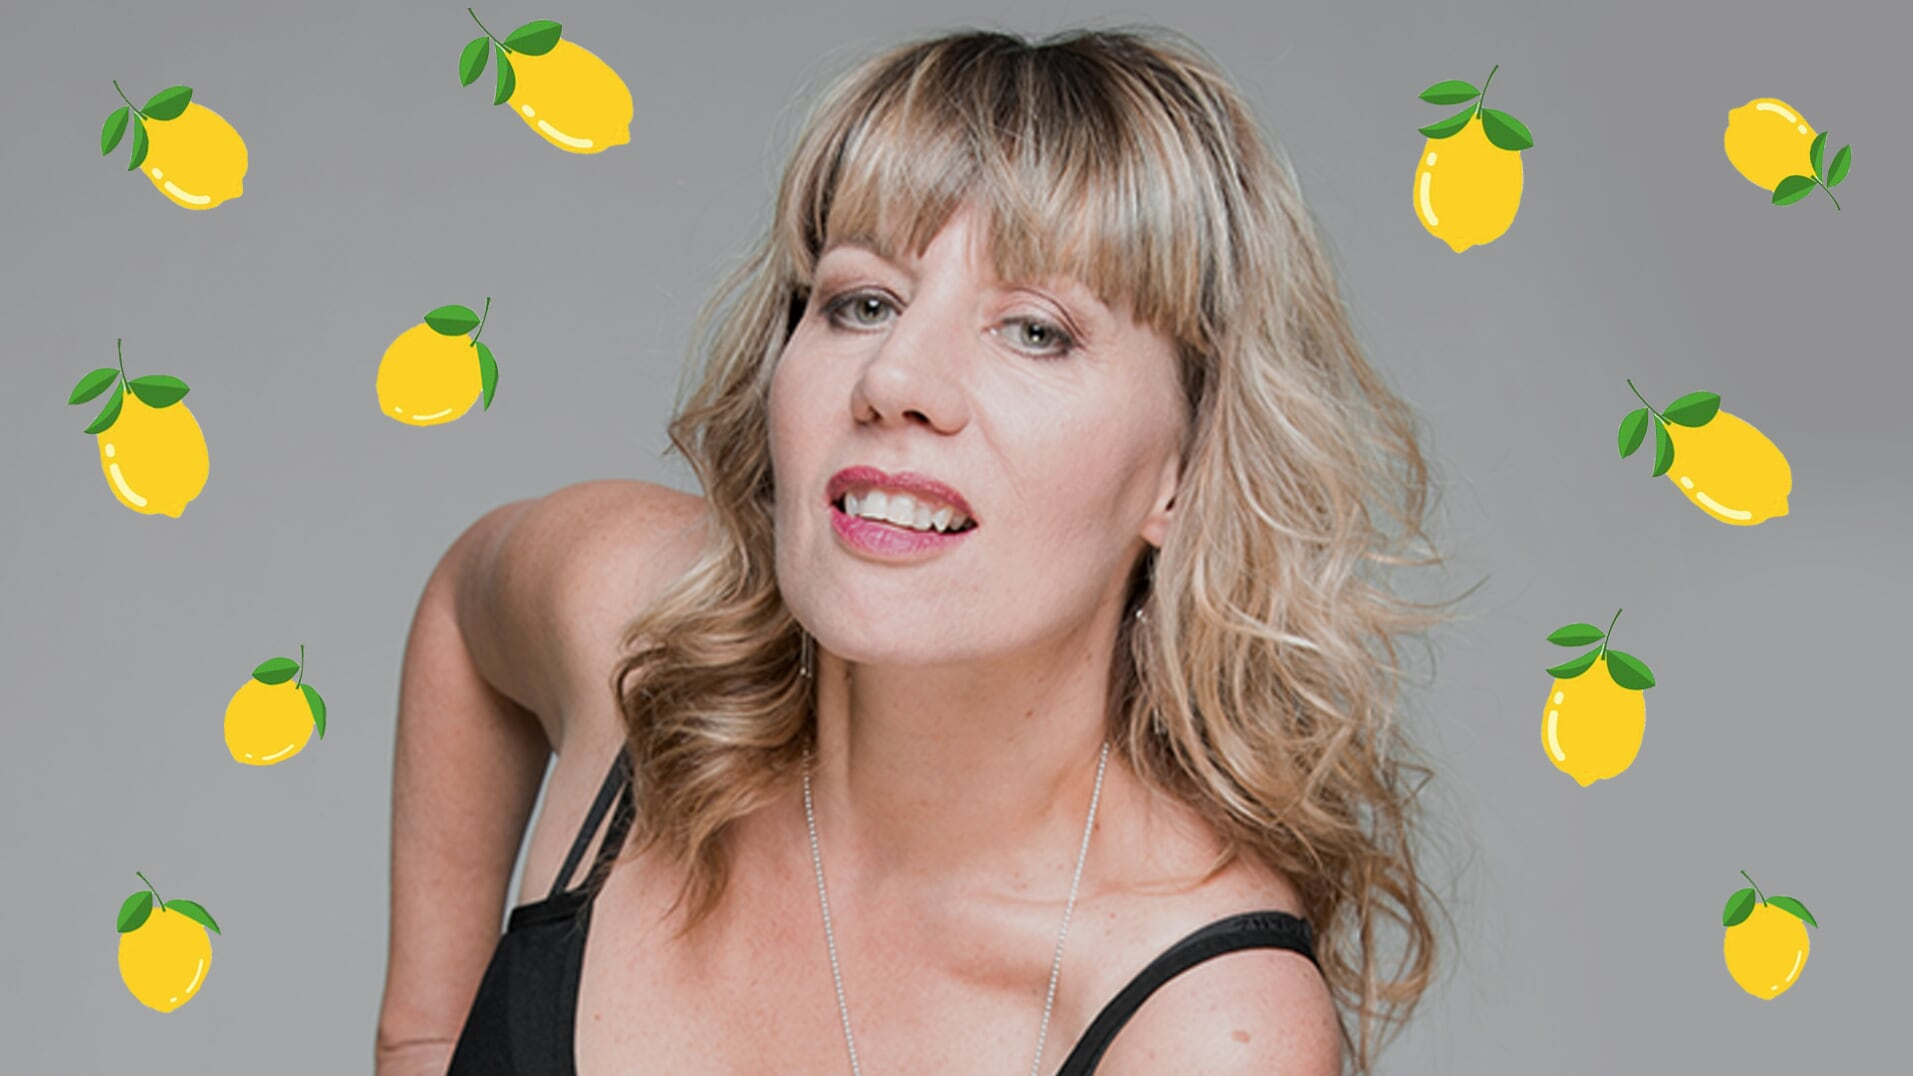 cath styles lemons.jpg